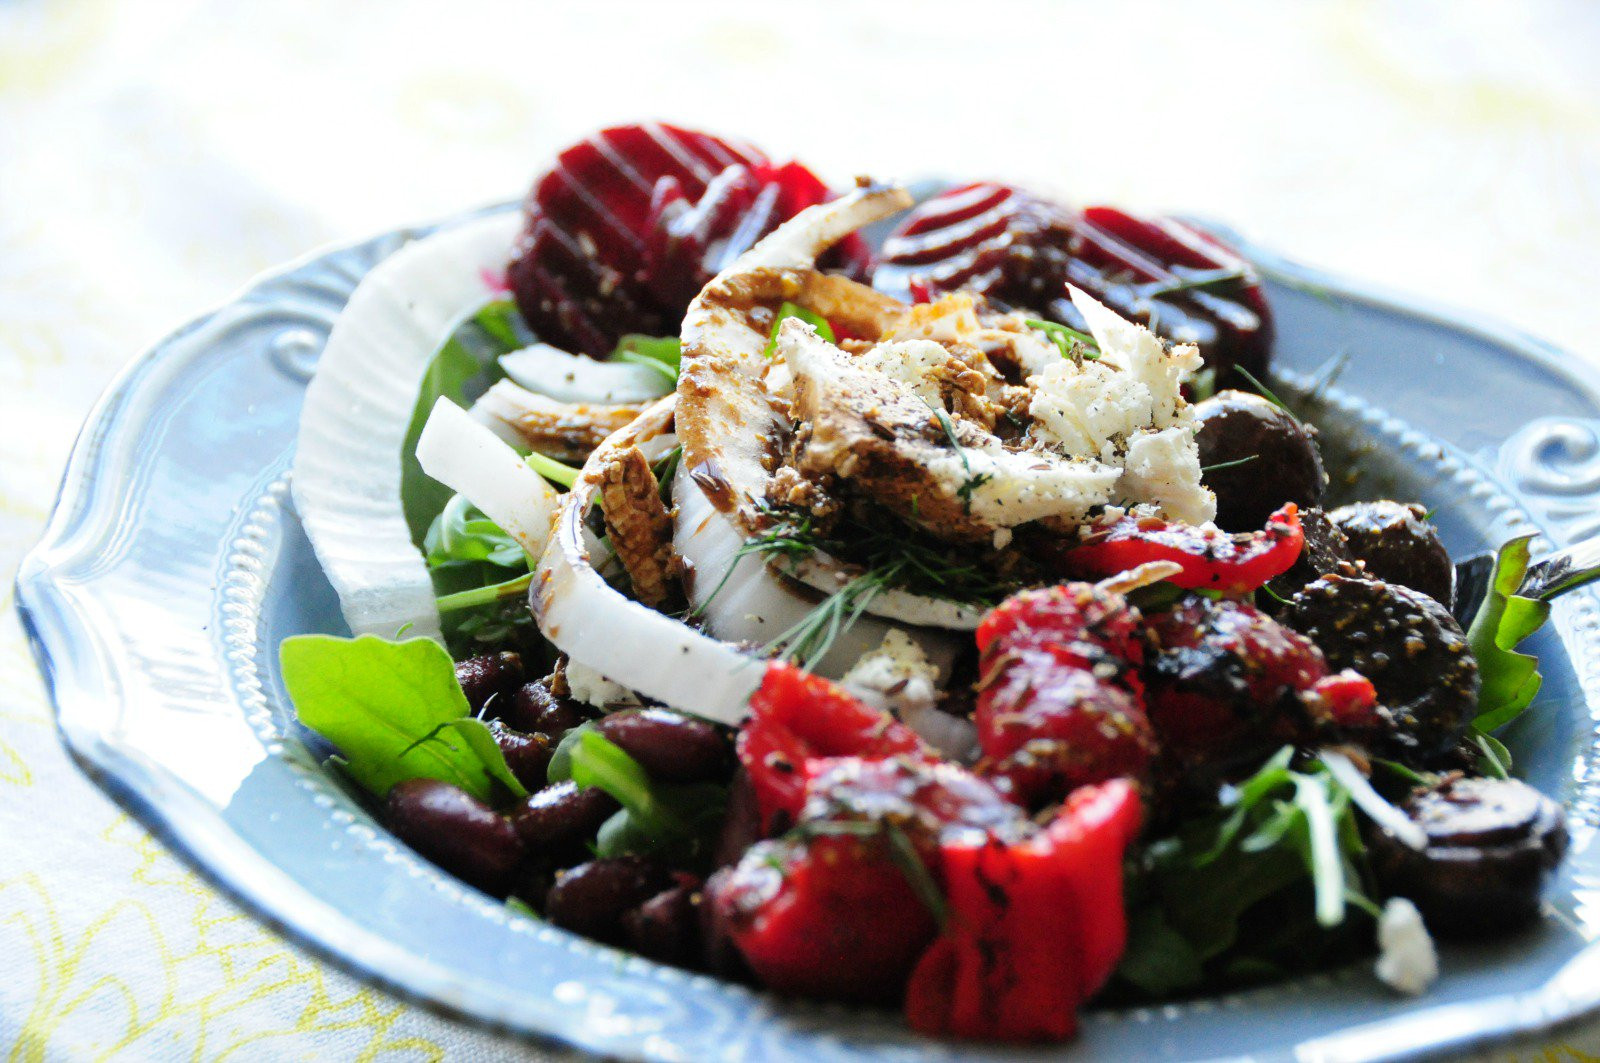 Dairy Free Salad Dressings  5 Oil Free Dairy Free Salad Dressings e Green